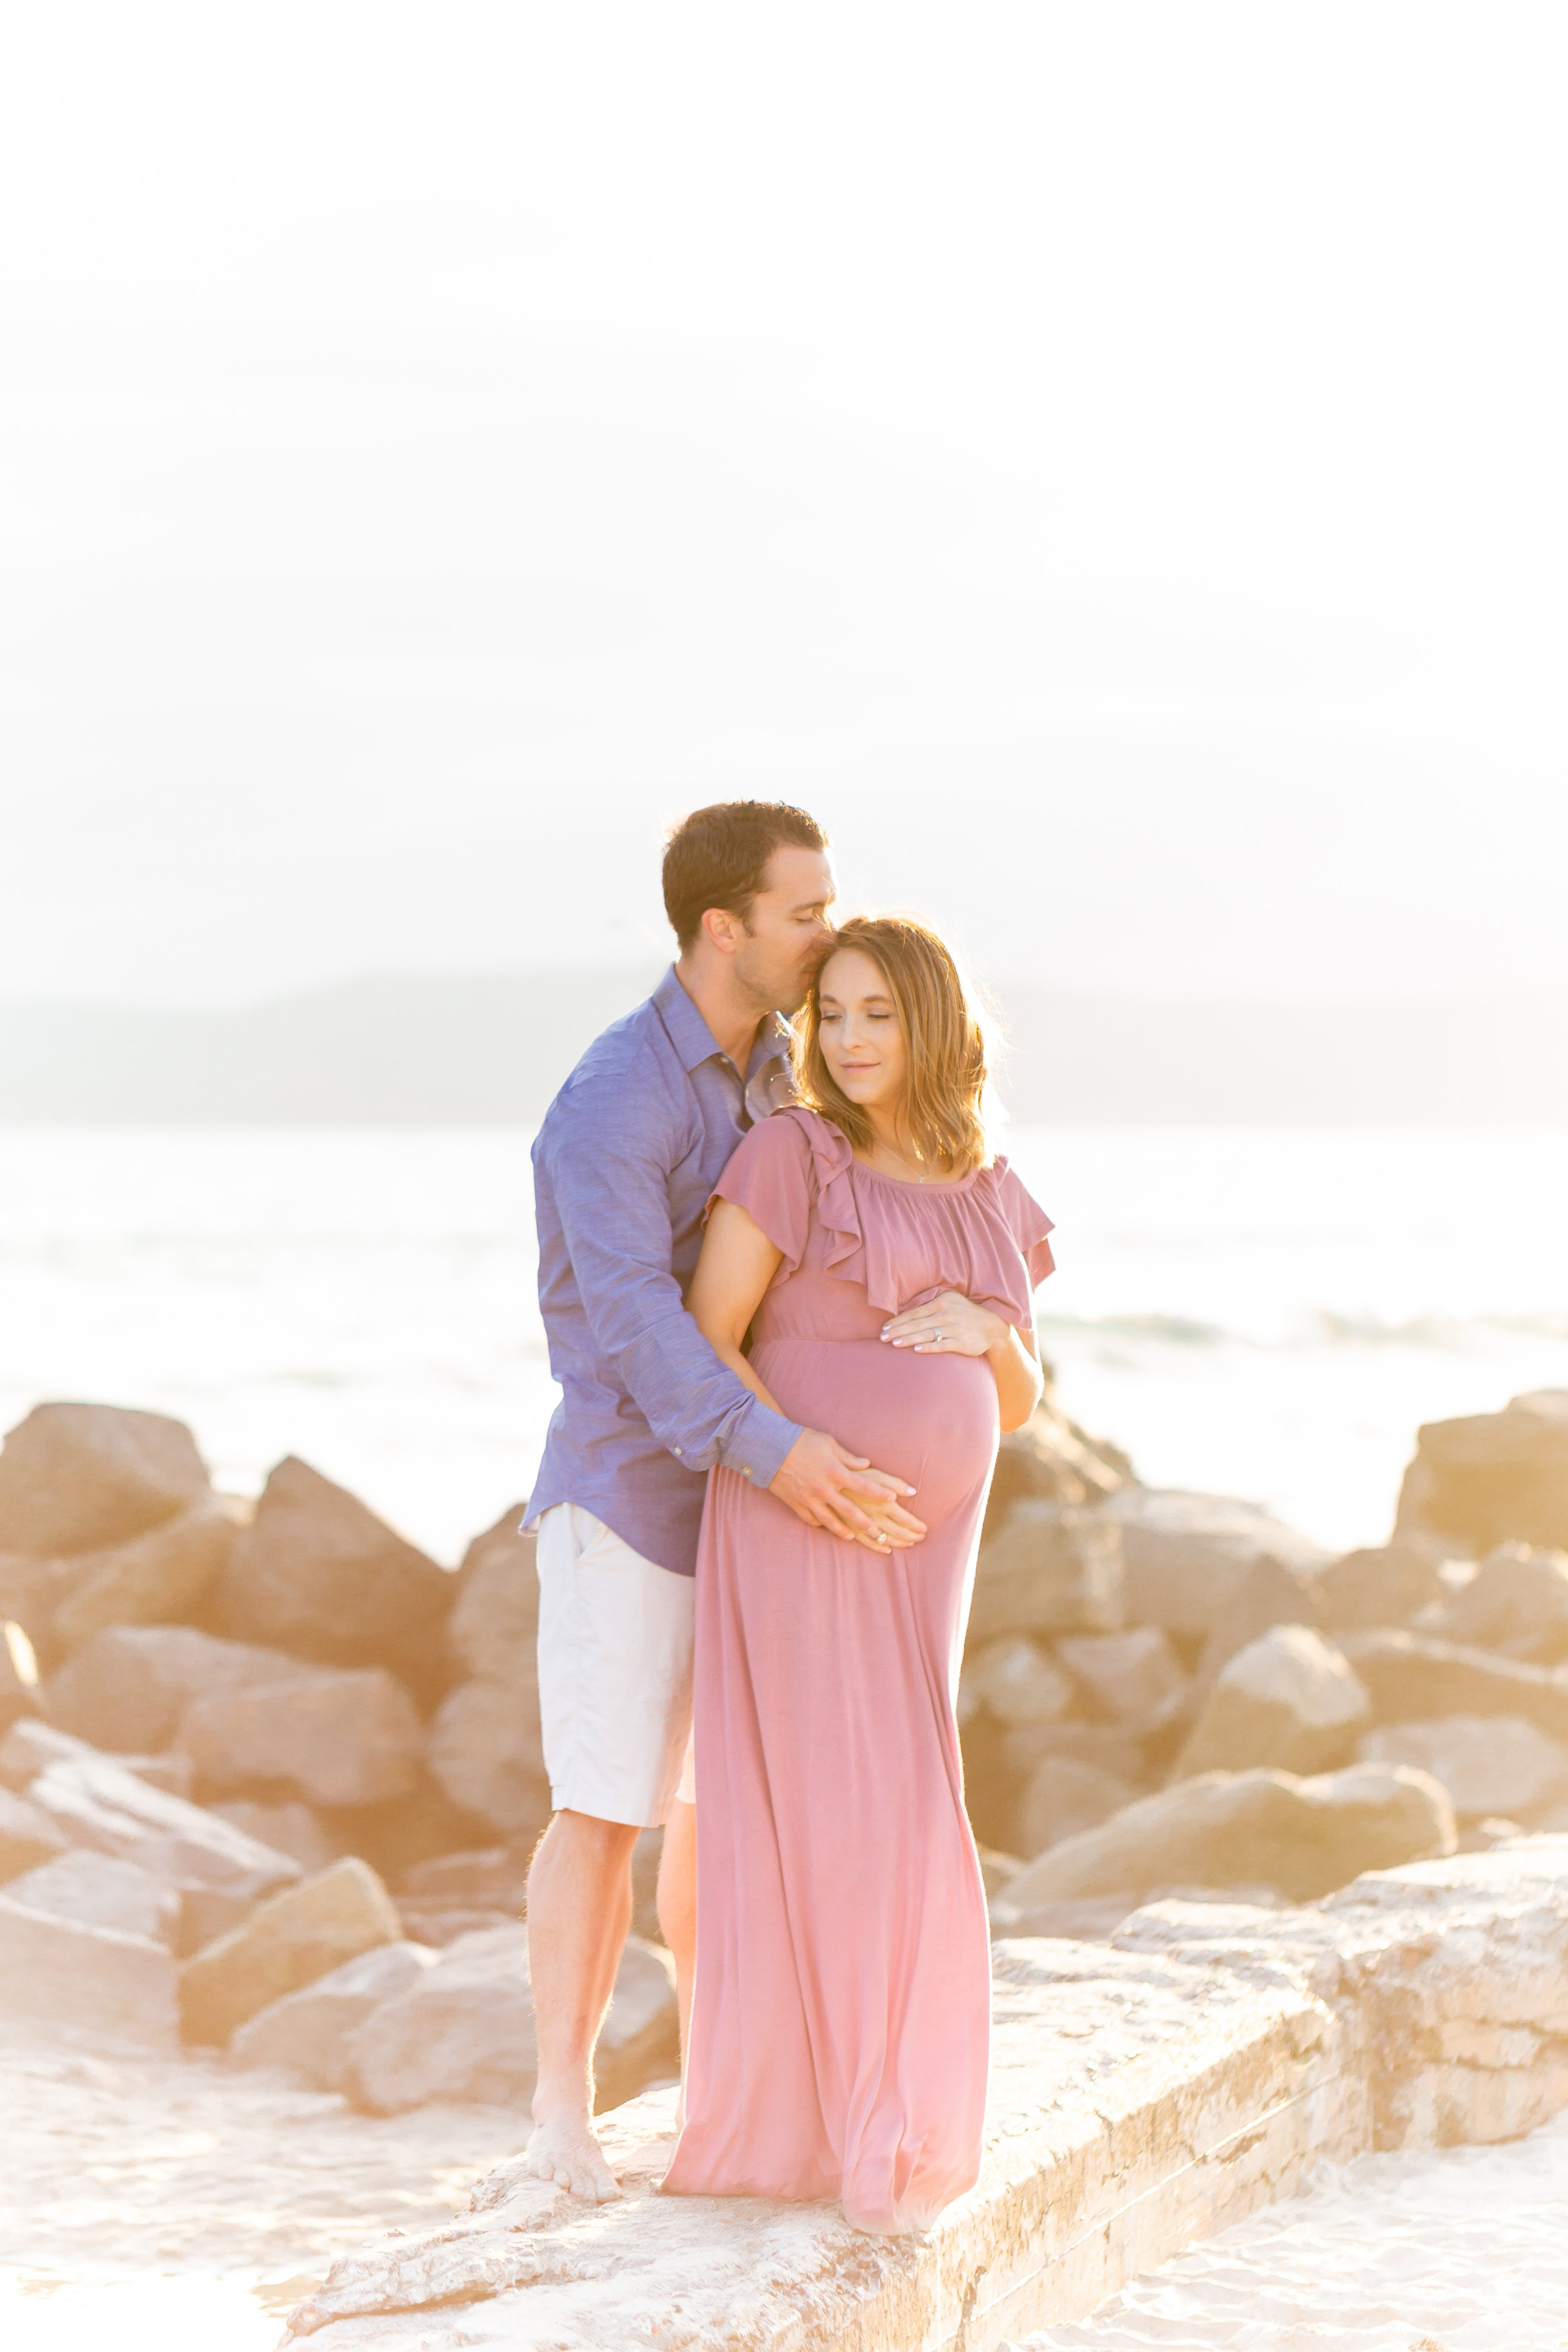 coronado maternity photo session